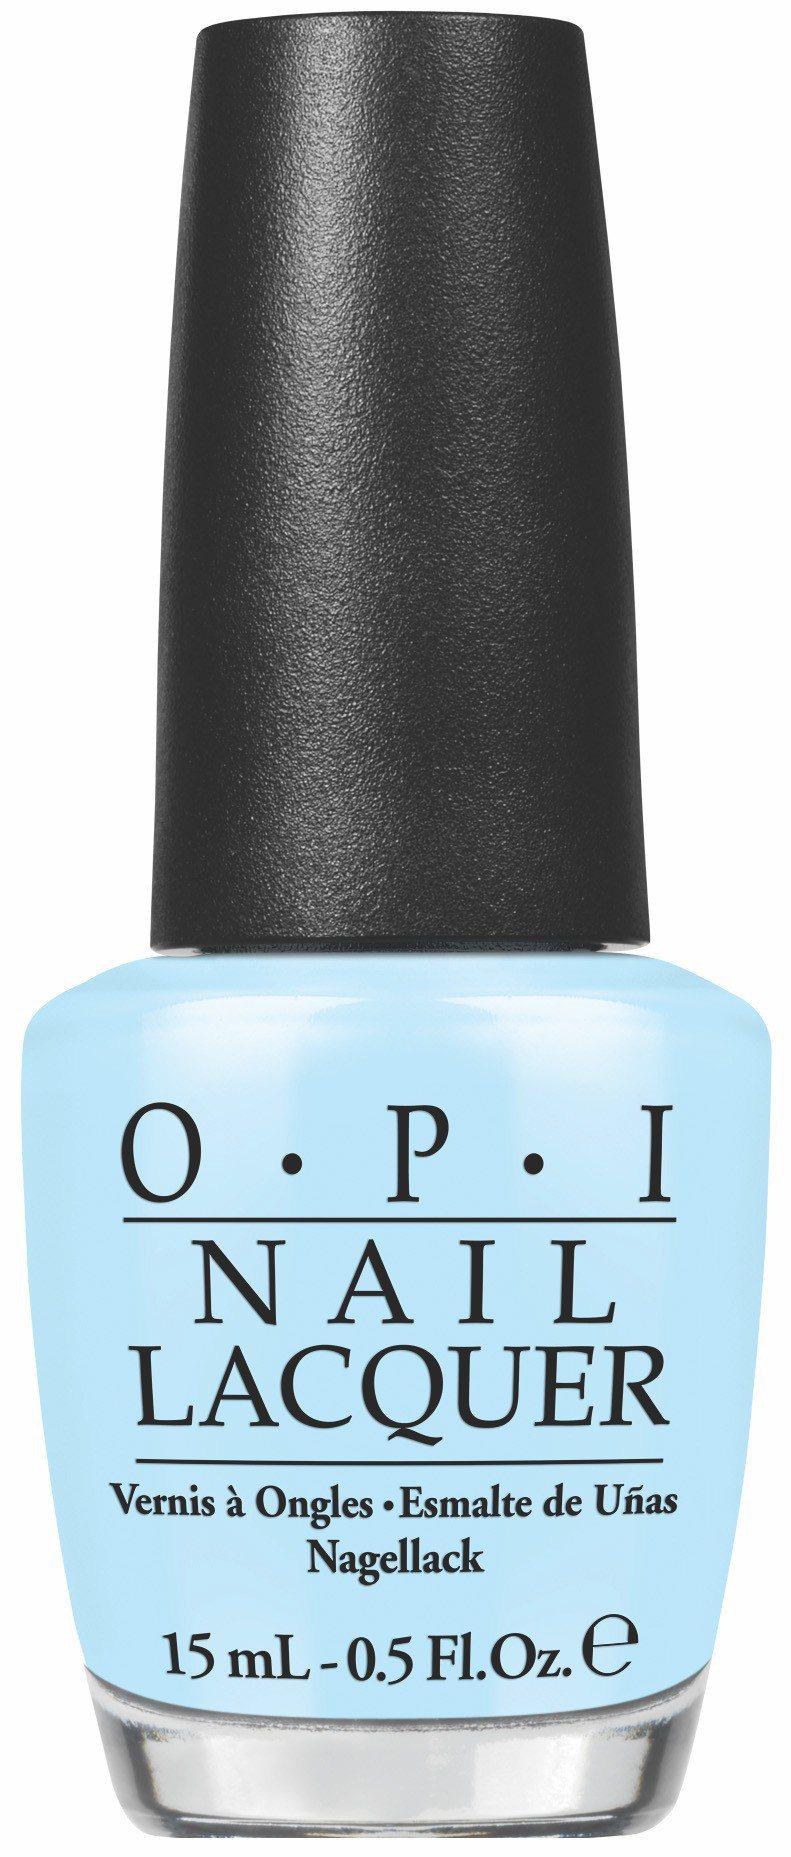 OPI推薦4款春夏熱銷的藍綠色系指彩,圖為#NLT75粉藍小男孩。圖/OPI提供